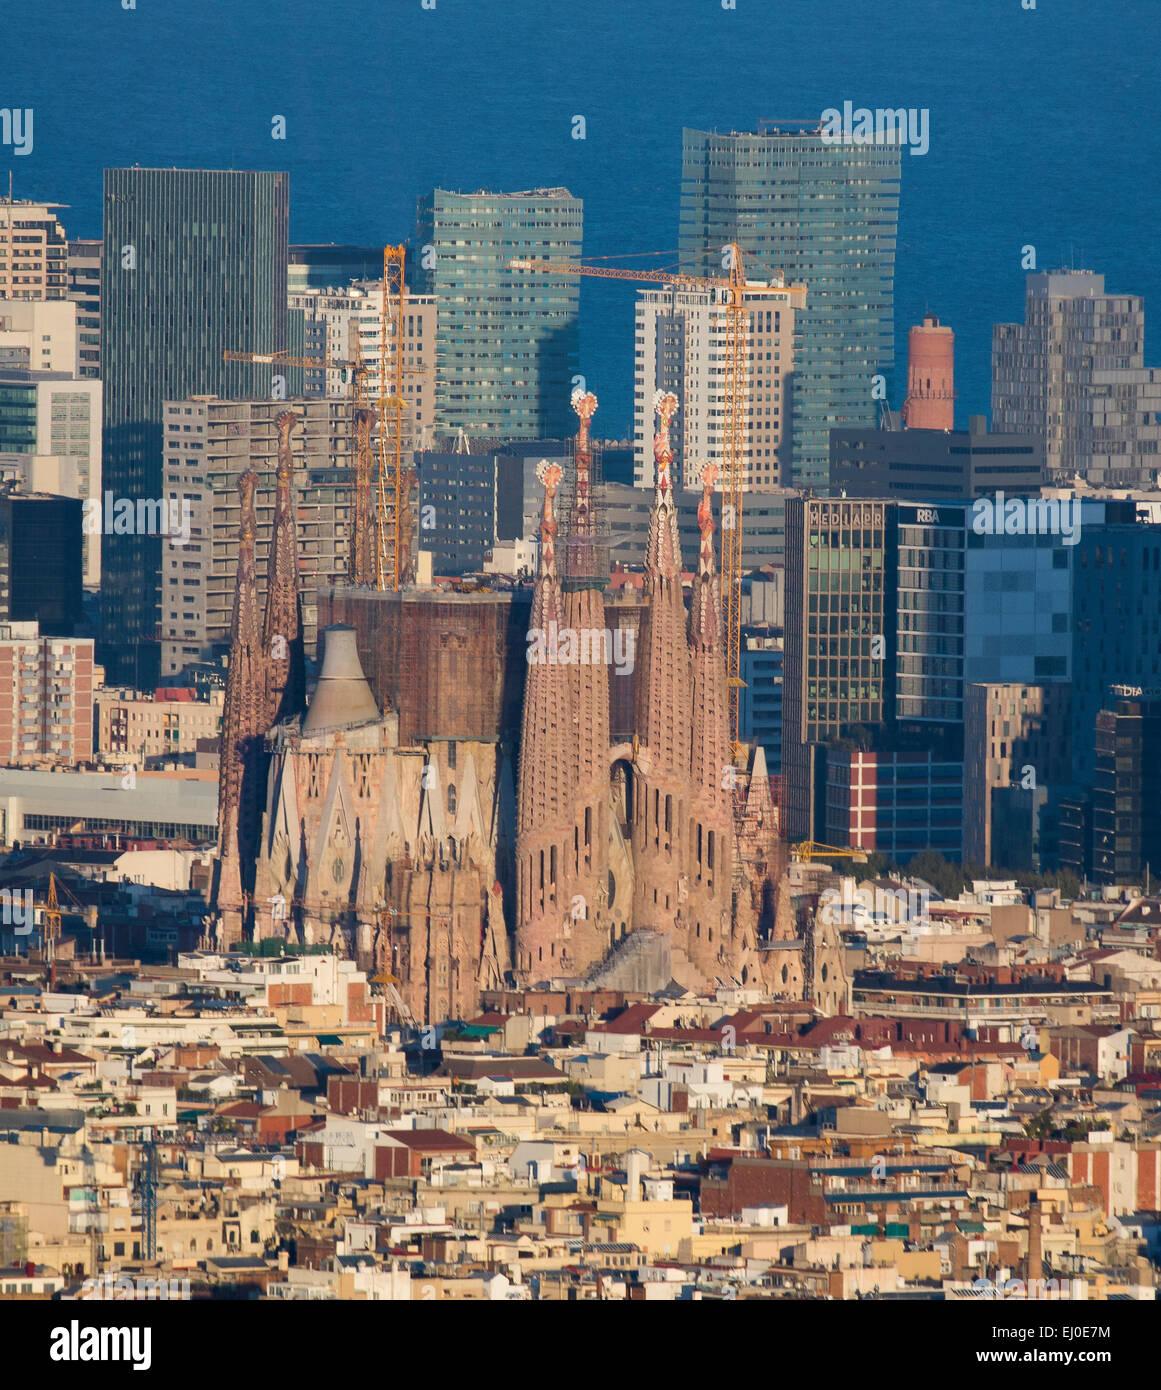 Barcelona, City, Cityscape, Sagrada Familia, church, Spain, Europe, aerial, agbar, architecture, Catalonia, fall, - Stock Image